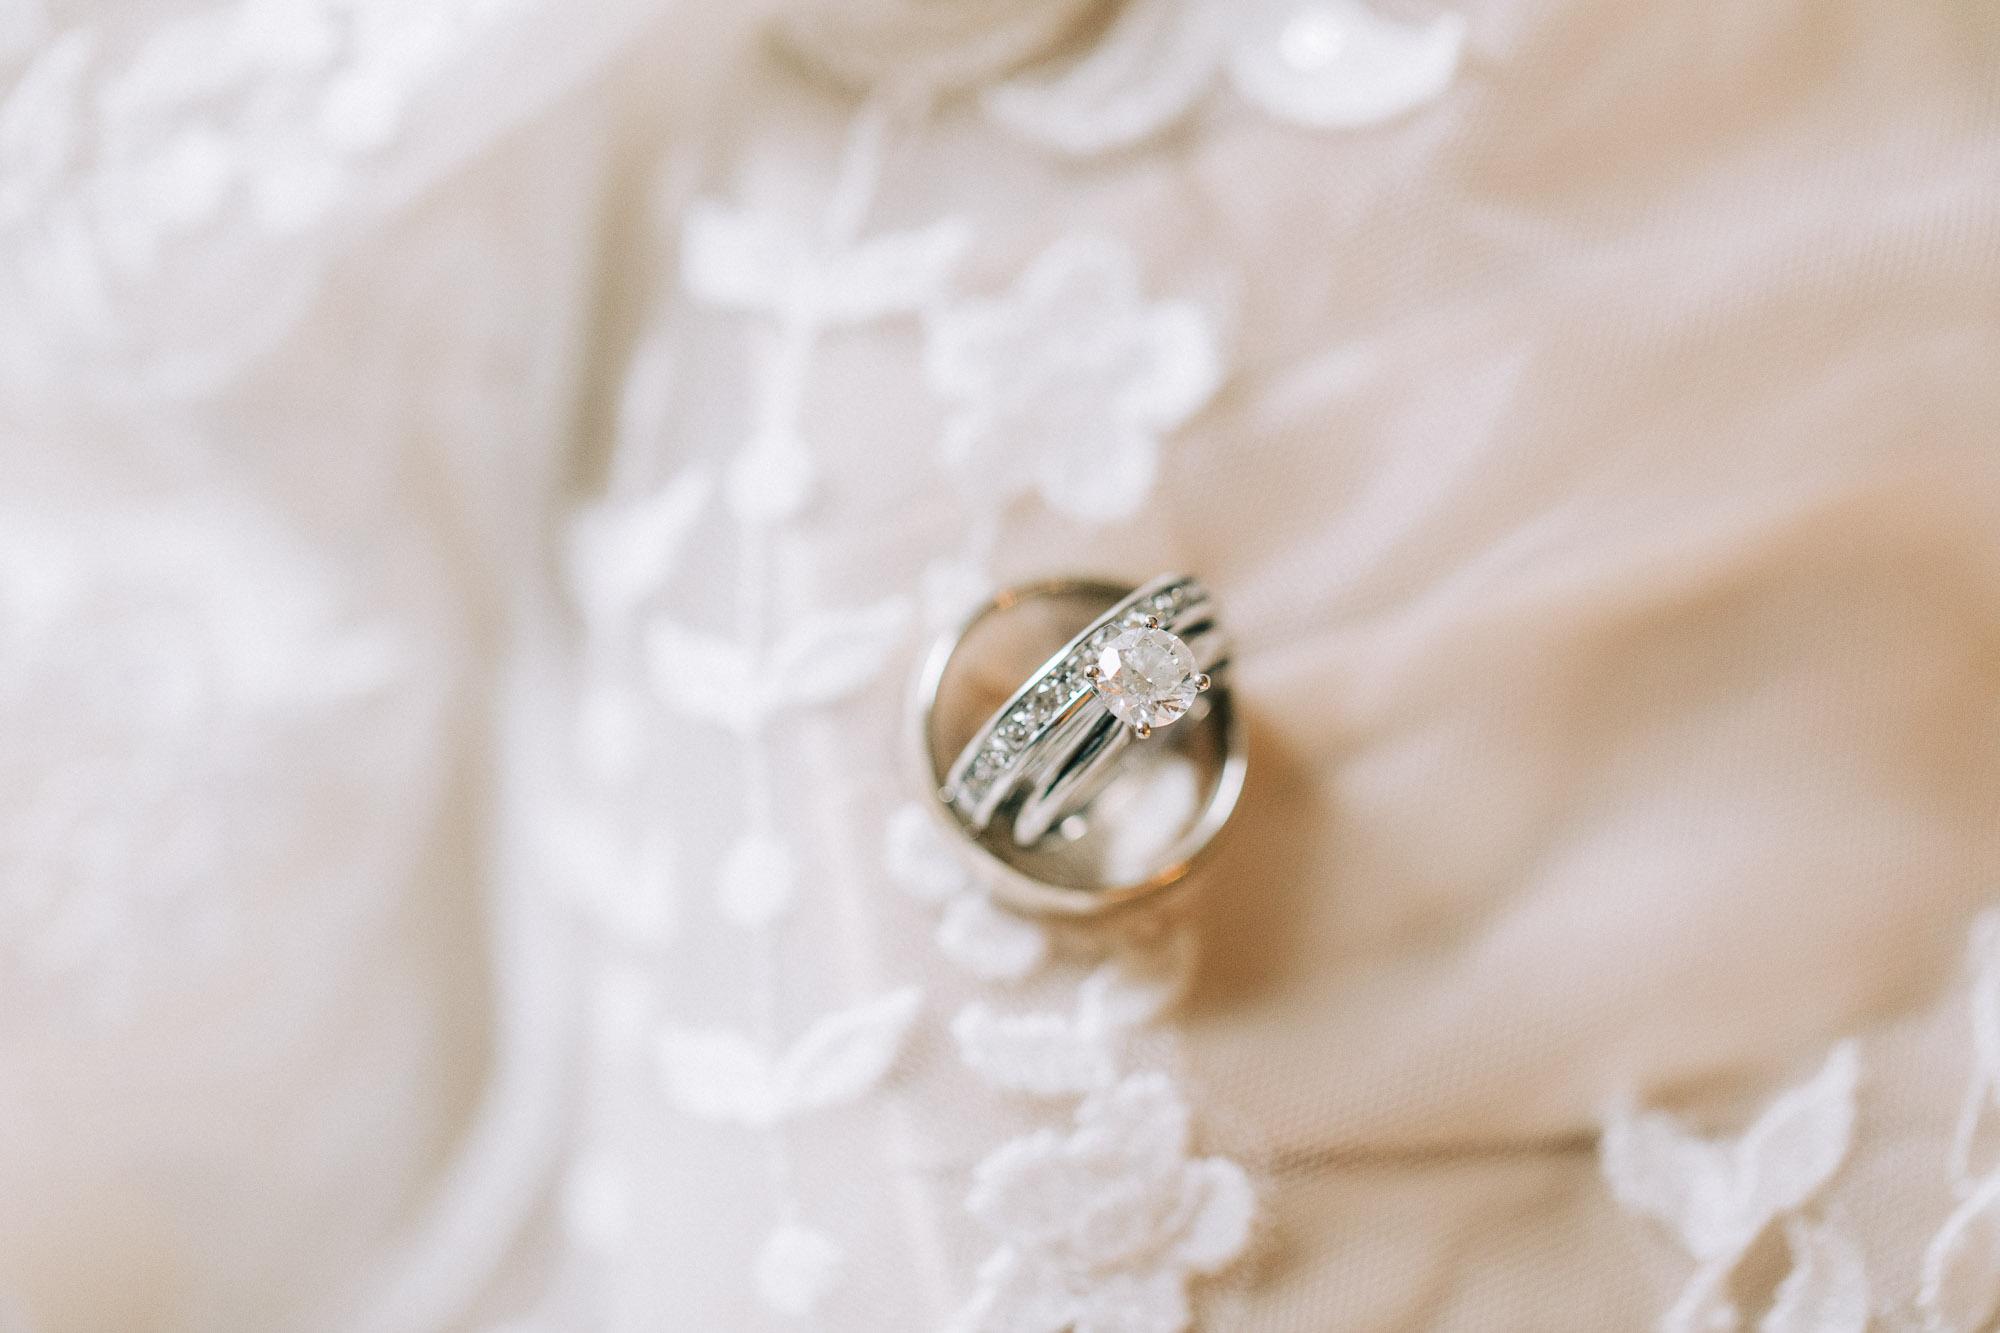 stonhedge-country-club-wedding-7748.jpg